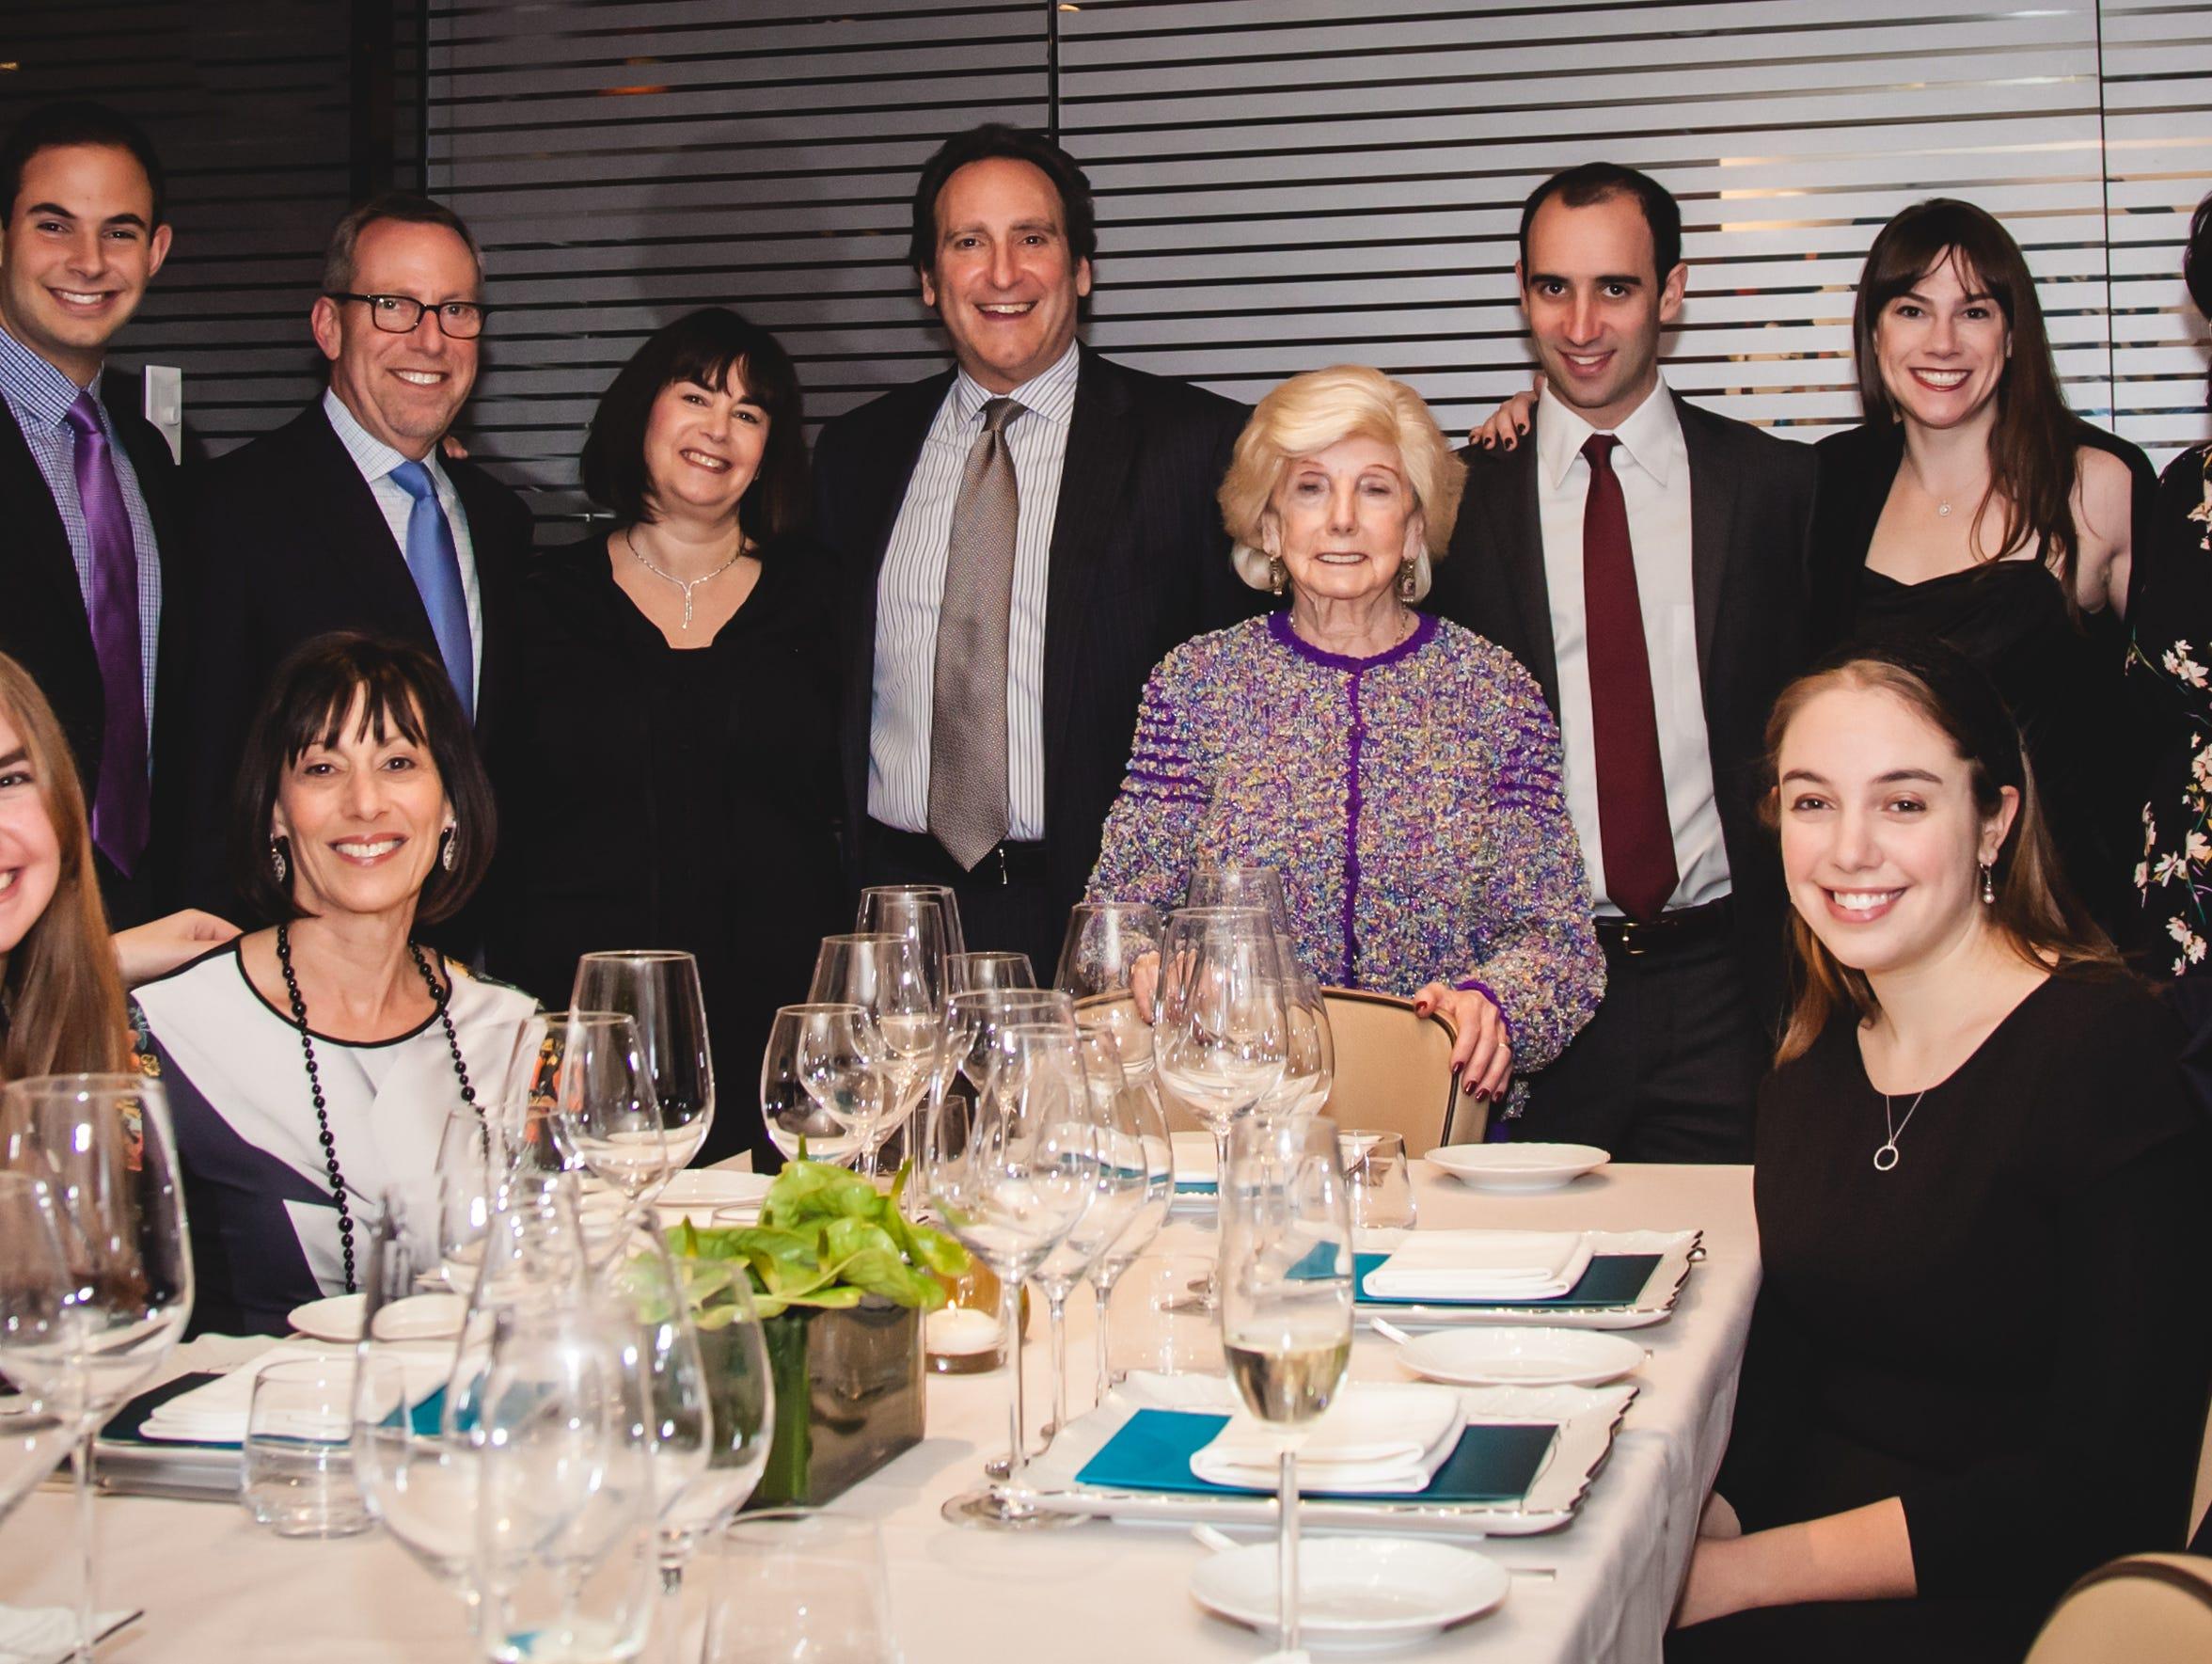 A Sass family gathering with Paul Sass' wife, Bernice